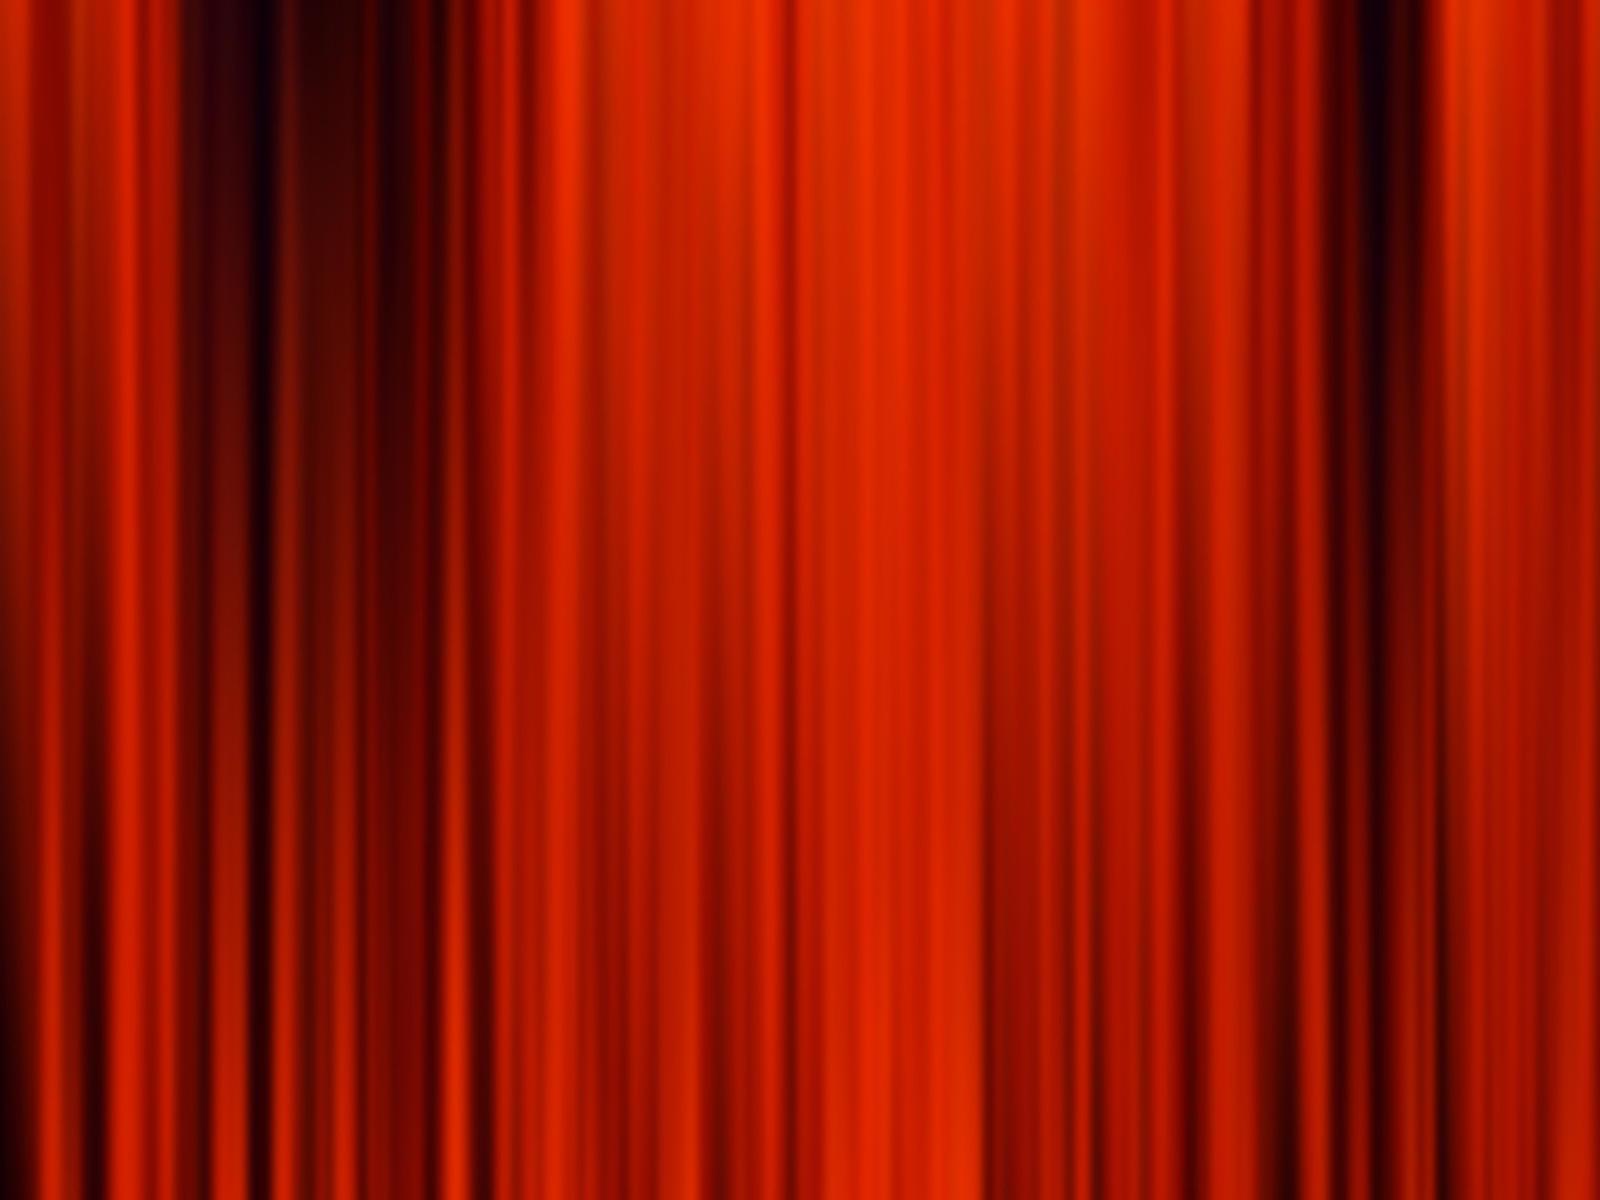 Curtain 2017 grasscloth wallpaper for Silk curtains texture